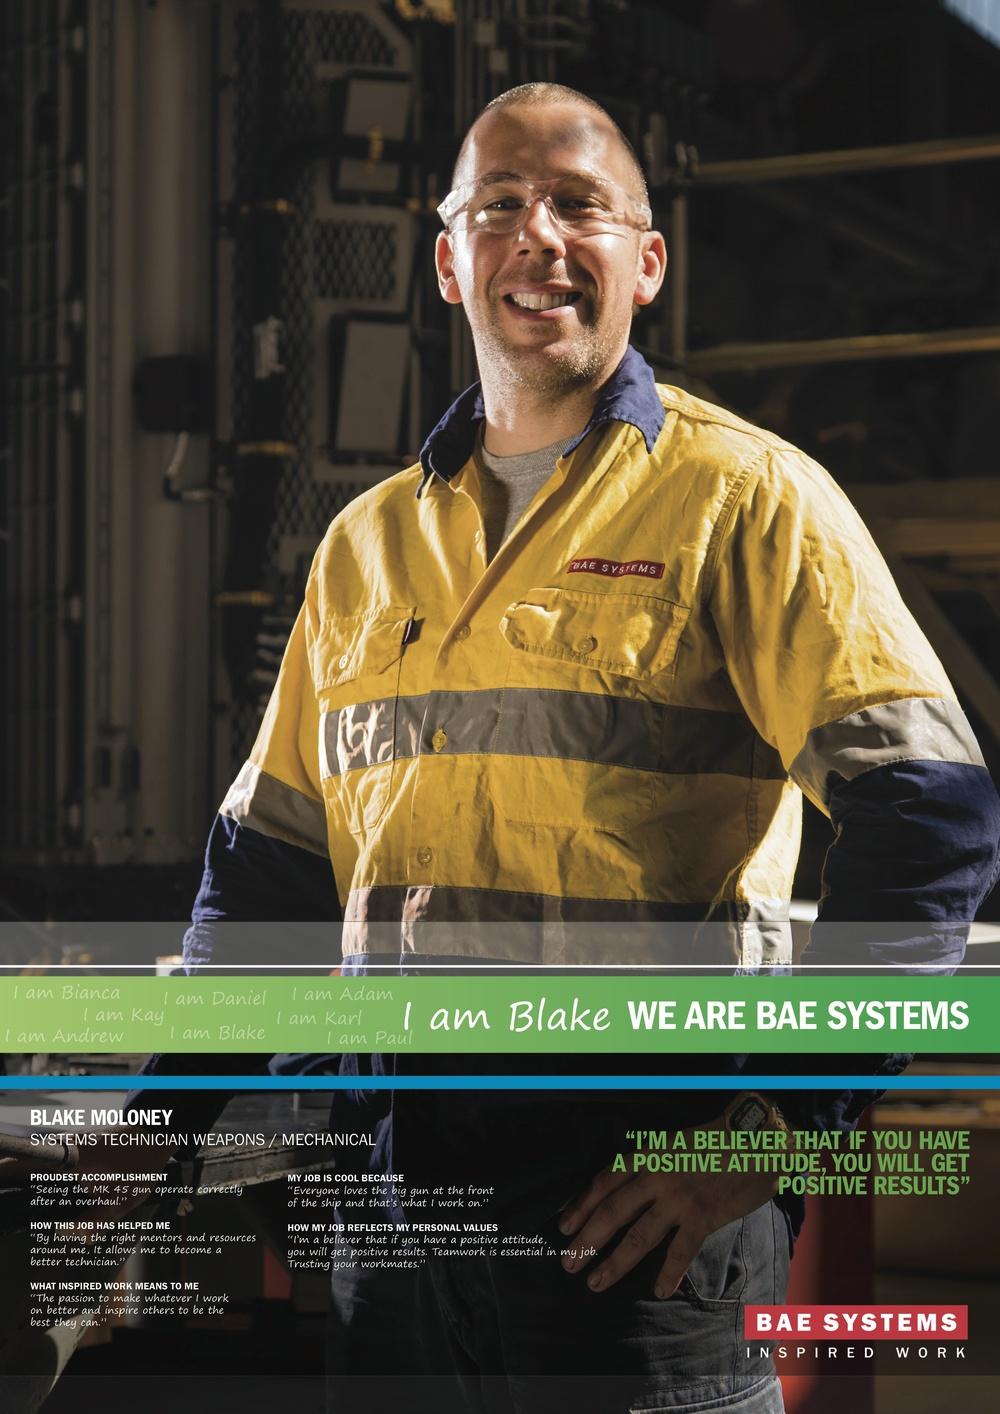 Blake_I am BAE Systems posters_Williamstown_maritime_180914.jpg